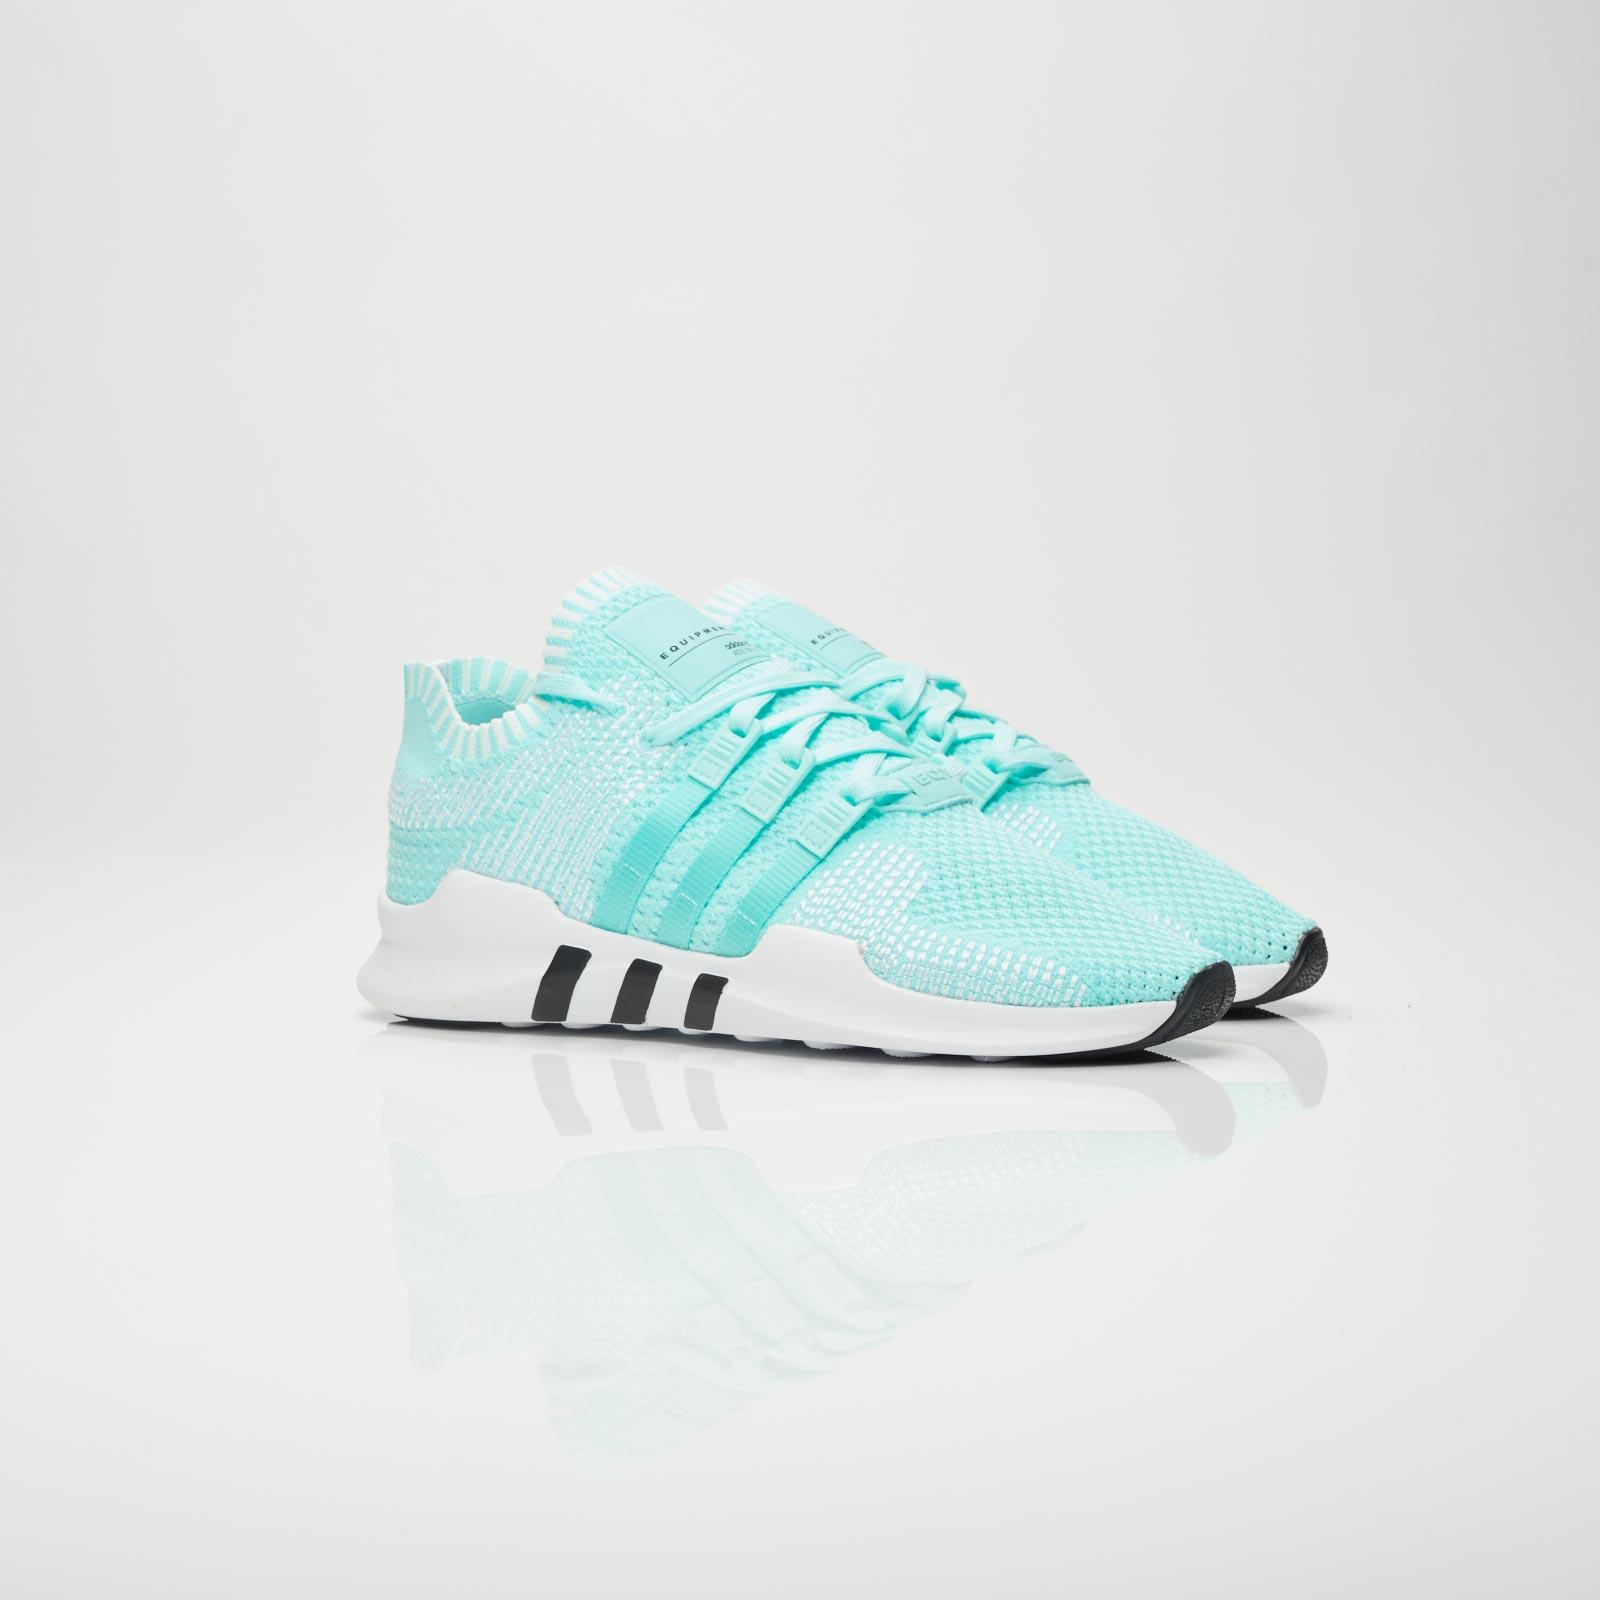 3c1557c7c82a adidas EQT Support ADV PK W - Bz0006 - Sneakersnstuff